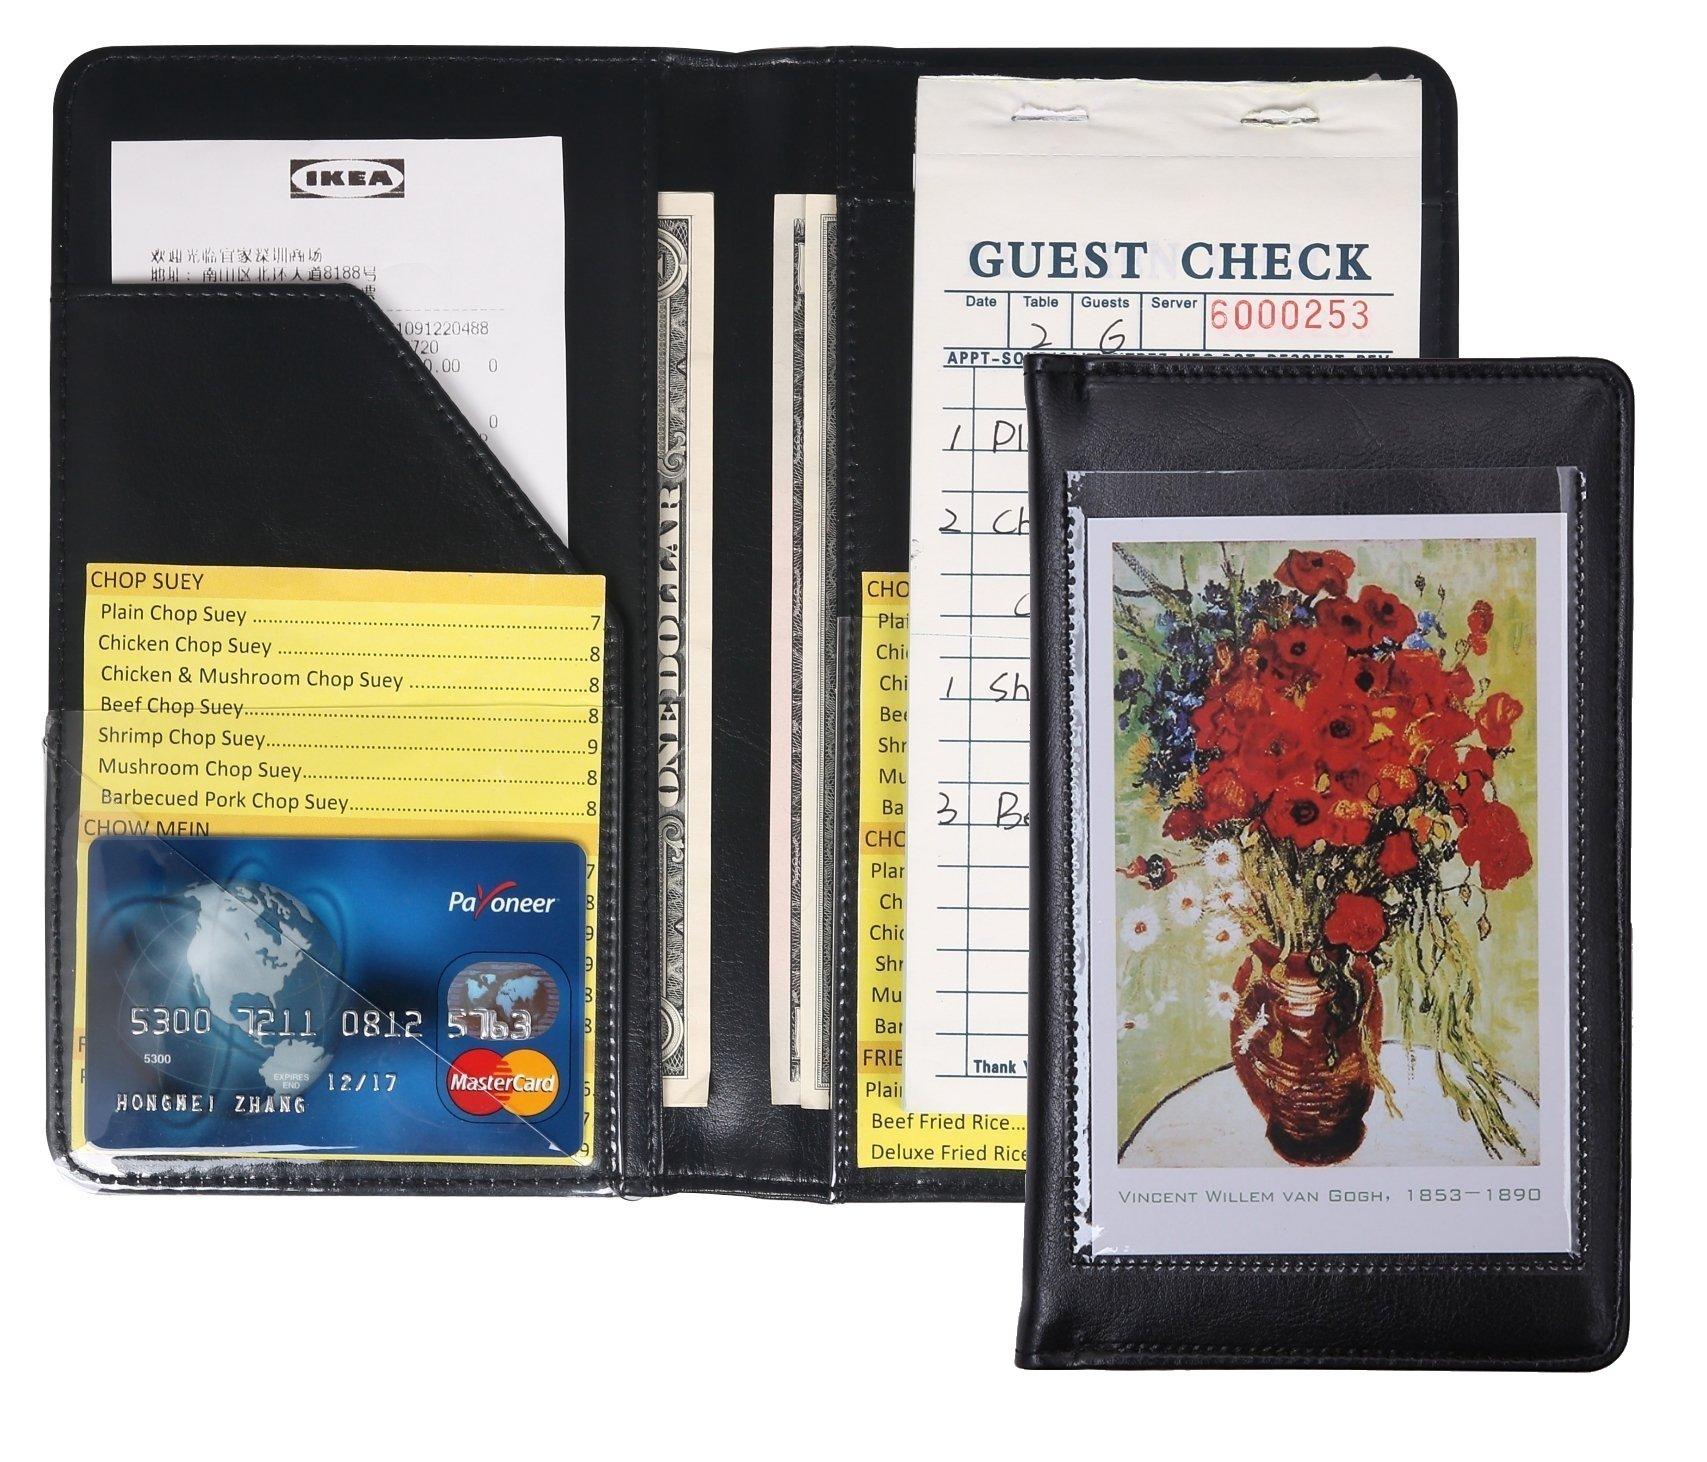 Mymazn Waiter Book Server Wallet Server Pads Waitress book Restaurant Waitstaff Organizer, Guest Check Book Holder Money Pocket Fit Server Apron (Black)